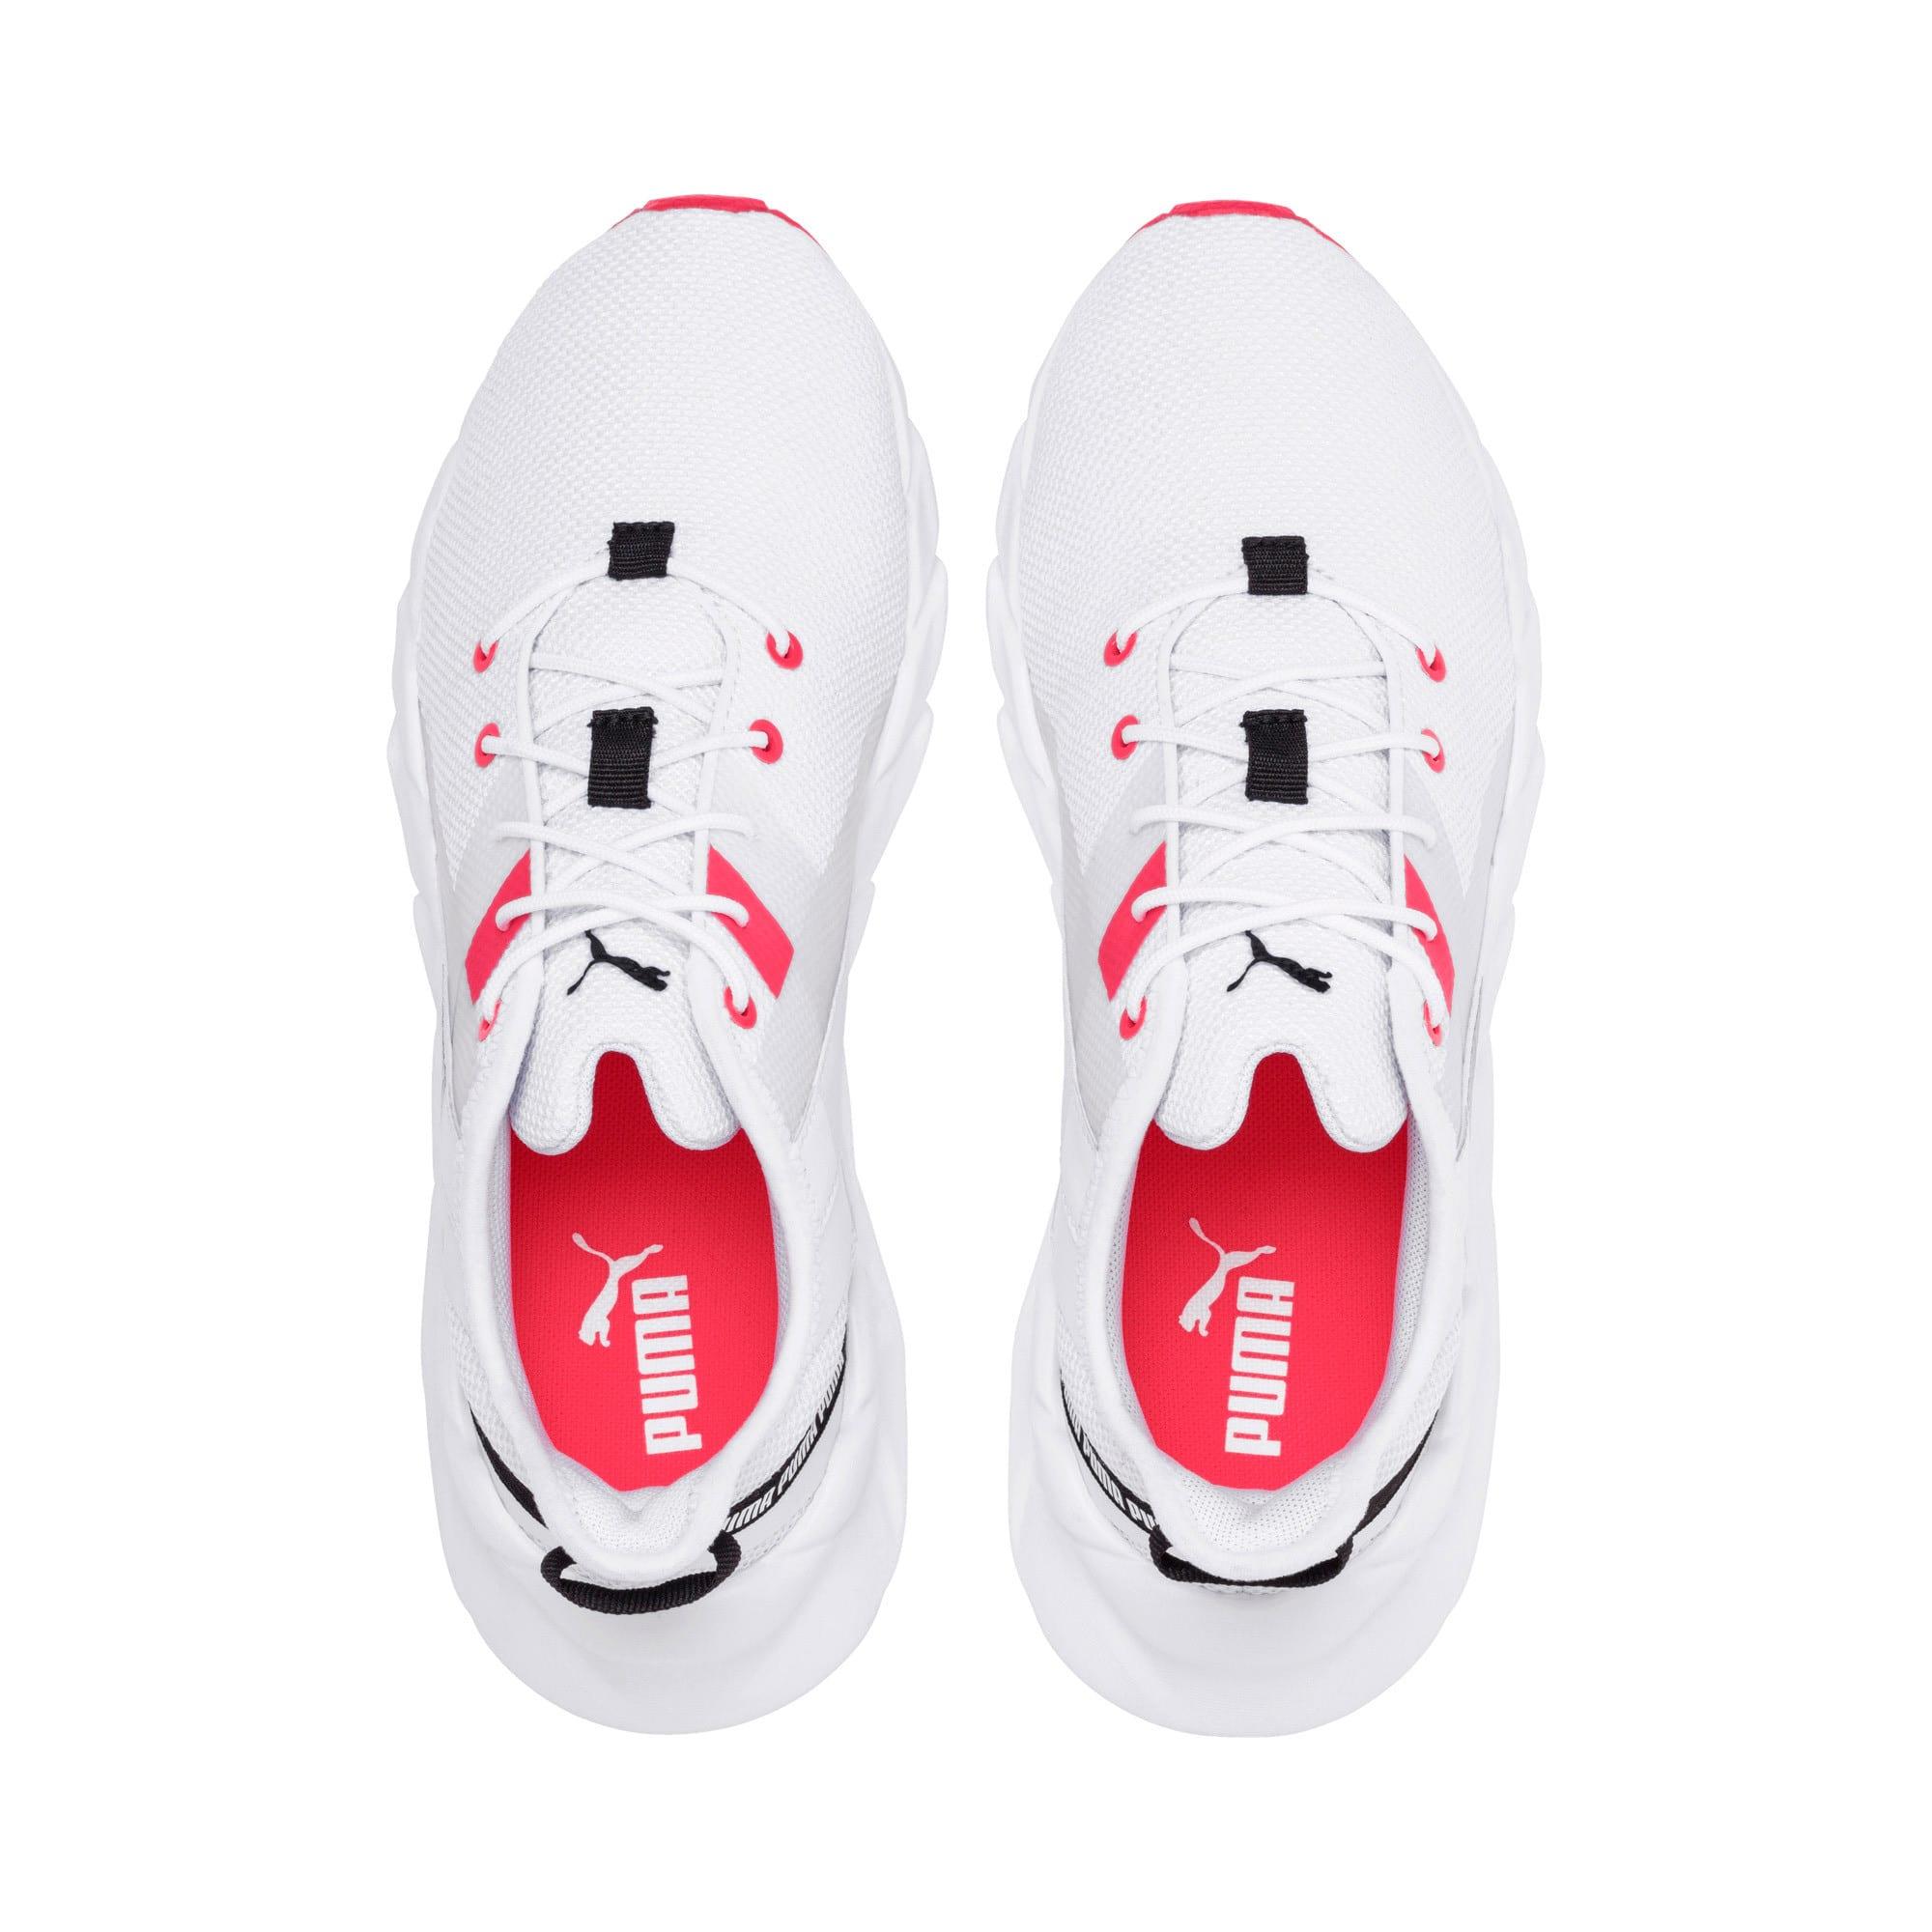 Thumbnail 9 of Weave XT Women's Training Shoes, Puma White-Pink Alert, medium-IND